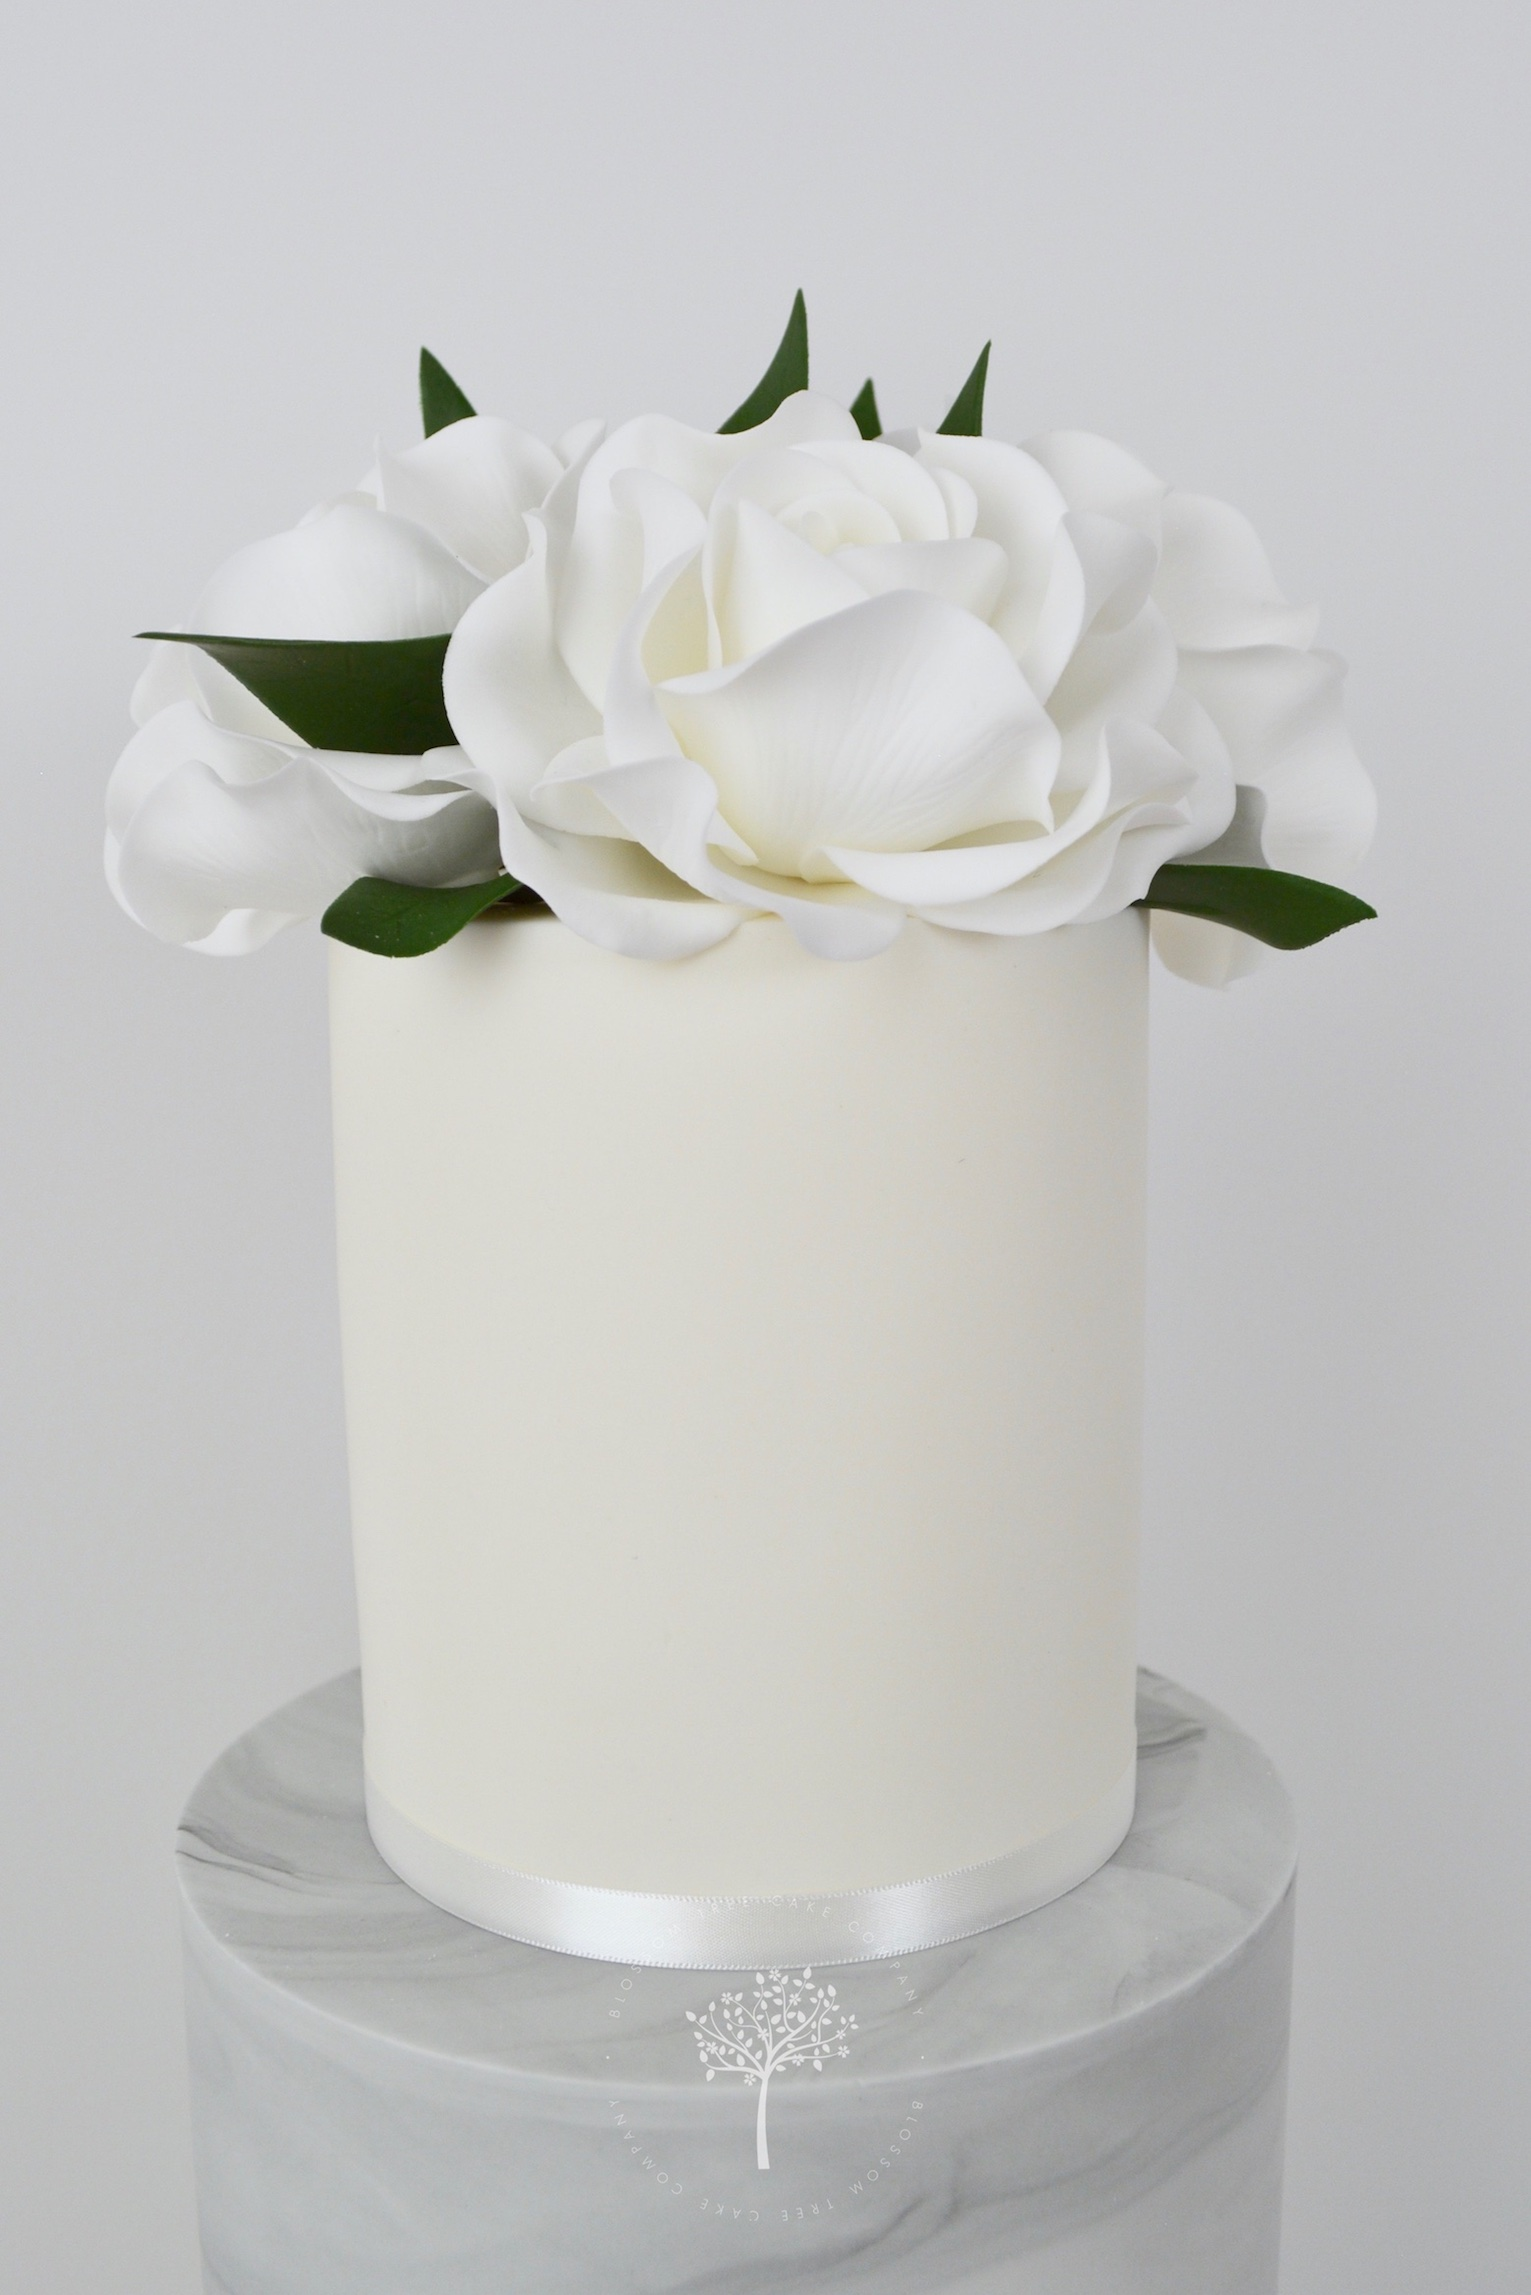 White Roses and Ranunculus wedding cake by Blossom Tree Cake Company Harrogate North Yorkshire - sugar roses.jpg